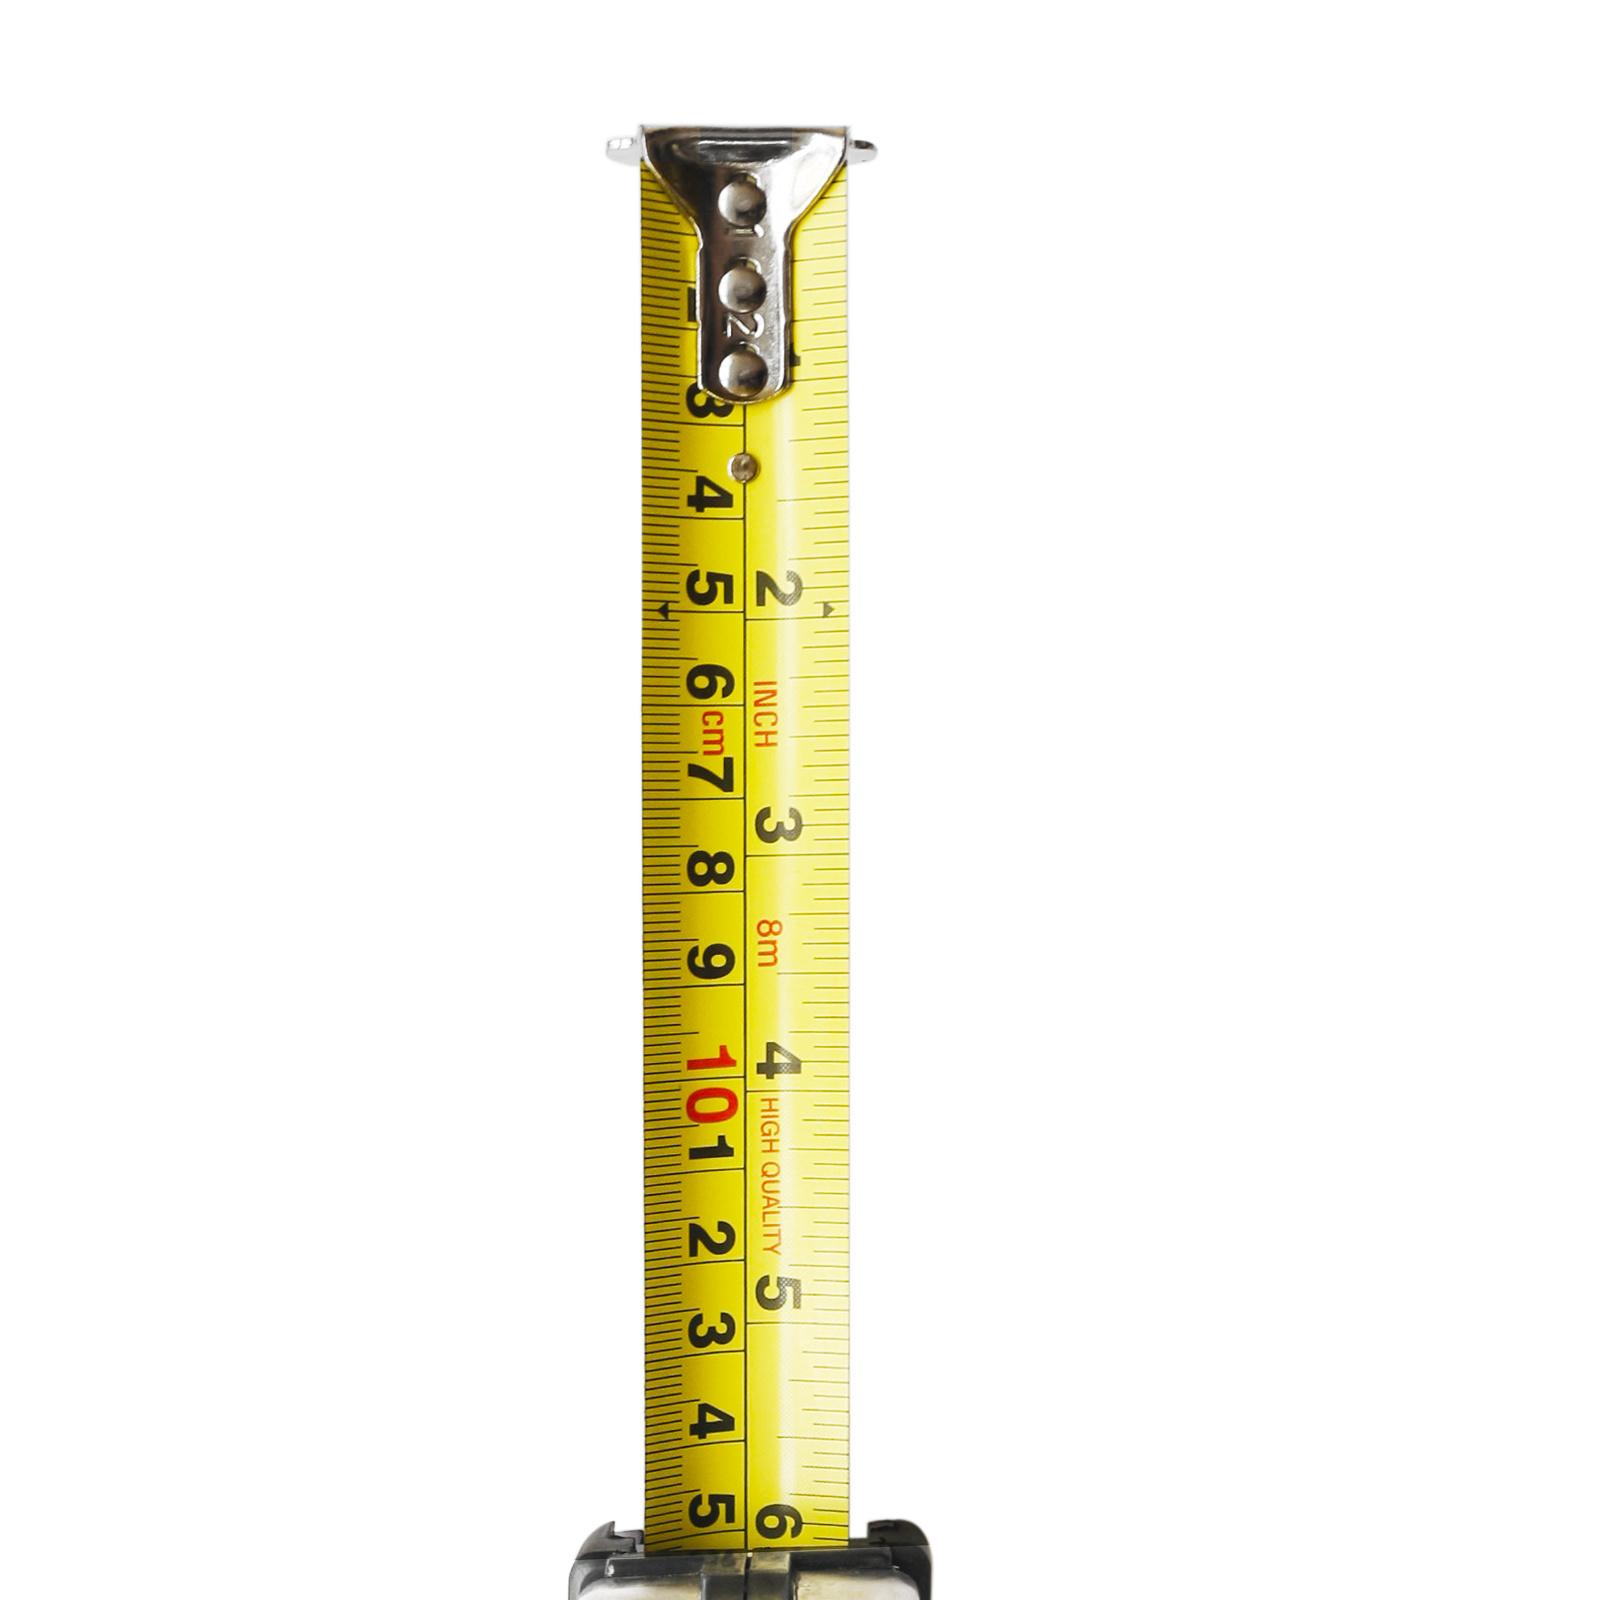 8m Auto Lock Steel Tape Measure with Nylon Coated Dual Blade